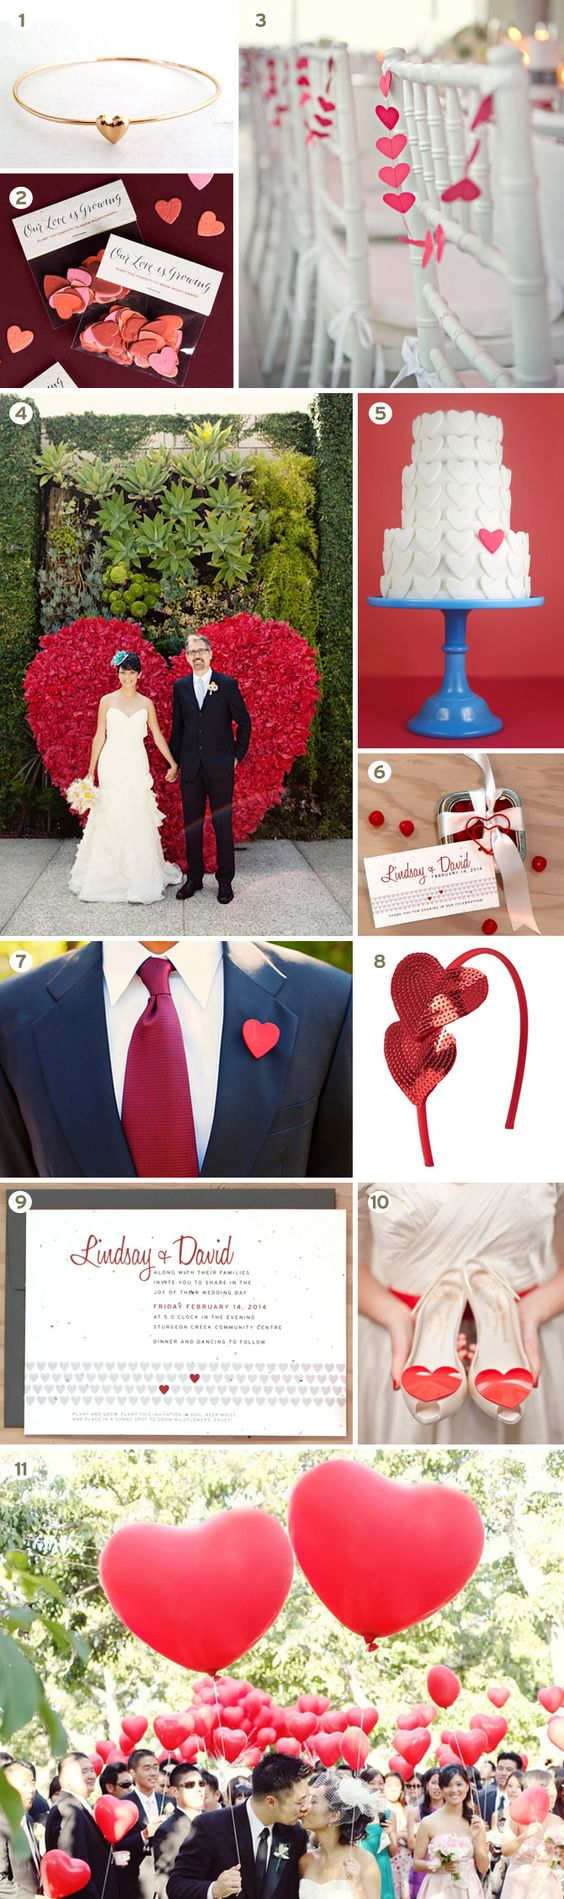 Matrimonio a tema cuori – Inspiration Weekend